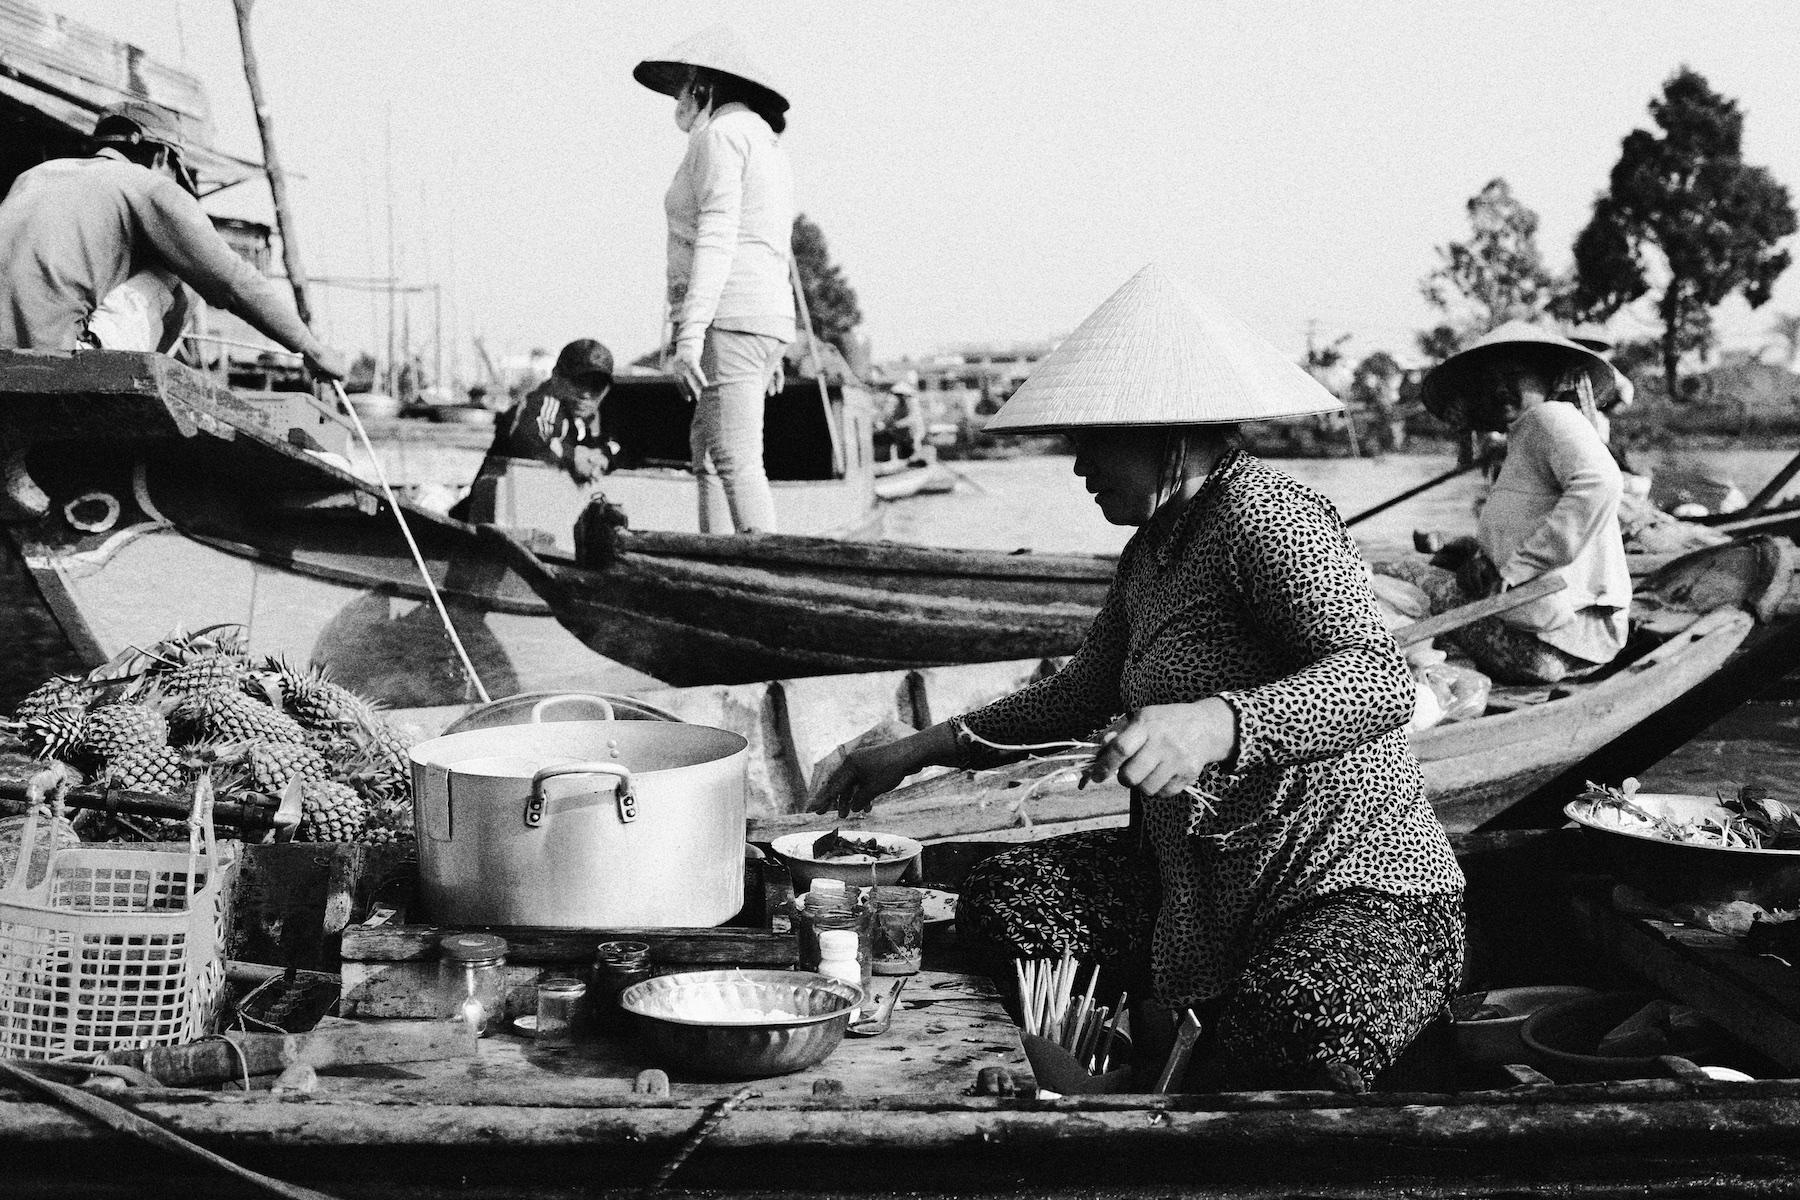 MEKONG DELTA VIETNAM © Manoah Biesheuvel 36